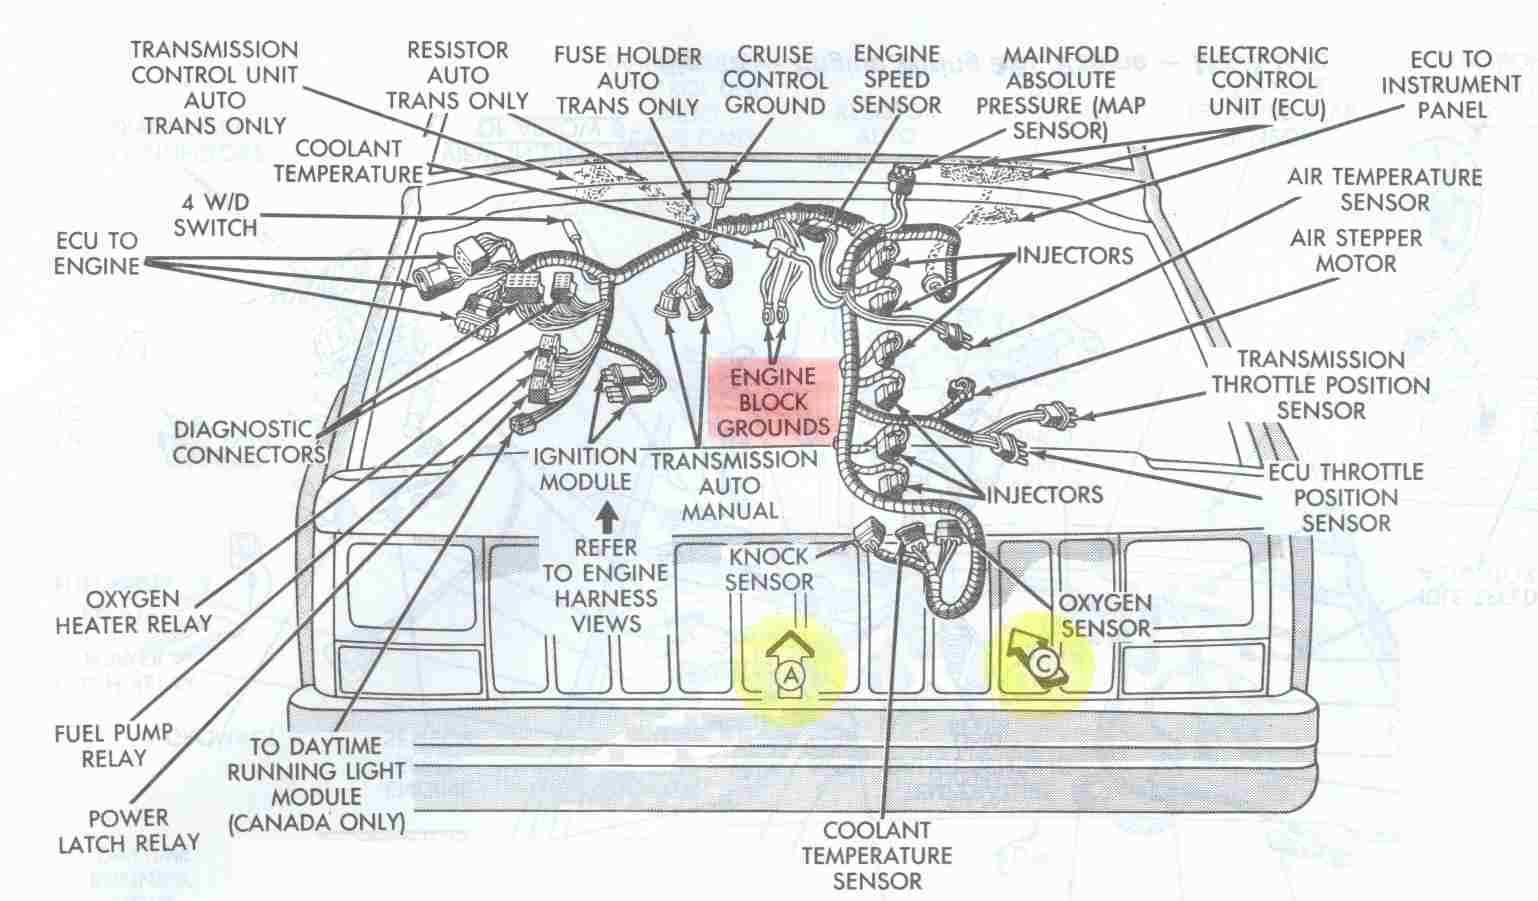 2011 Jetta Tdi Fuse Diagram together with 350 Chevy Ignition Diagram in addition 2014 Chevrolet Silverado Wiring Diagram also 97 C1500 Steering Wiring Diagram moreover 2008 Bmw 535i Fuse Diagram. on bmw i8 engine diagram